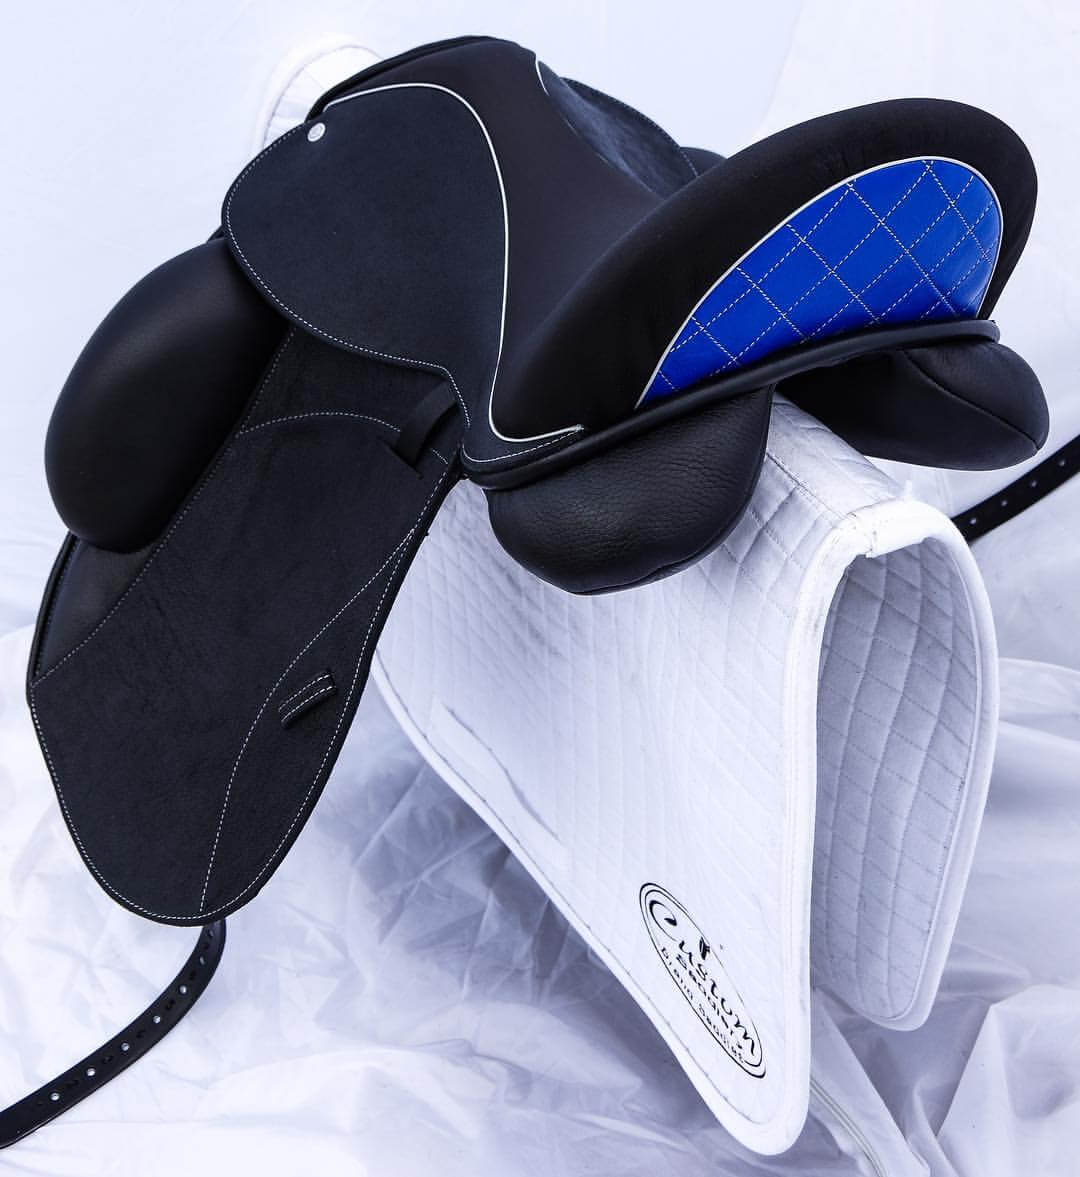 Icon black mid blue paten basketweave white welt - Custom Saddlery, Dressage Saddles   Drakesaddlesavvy.com